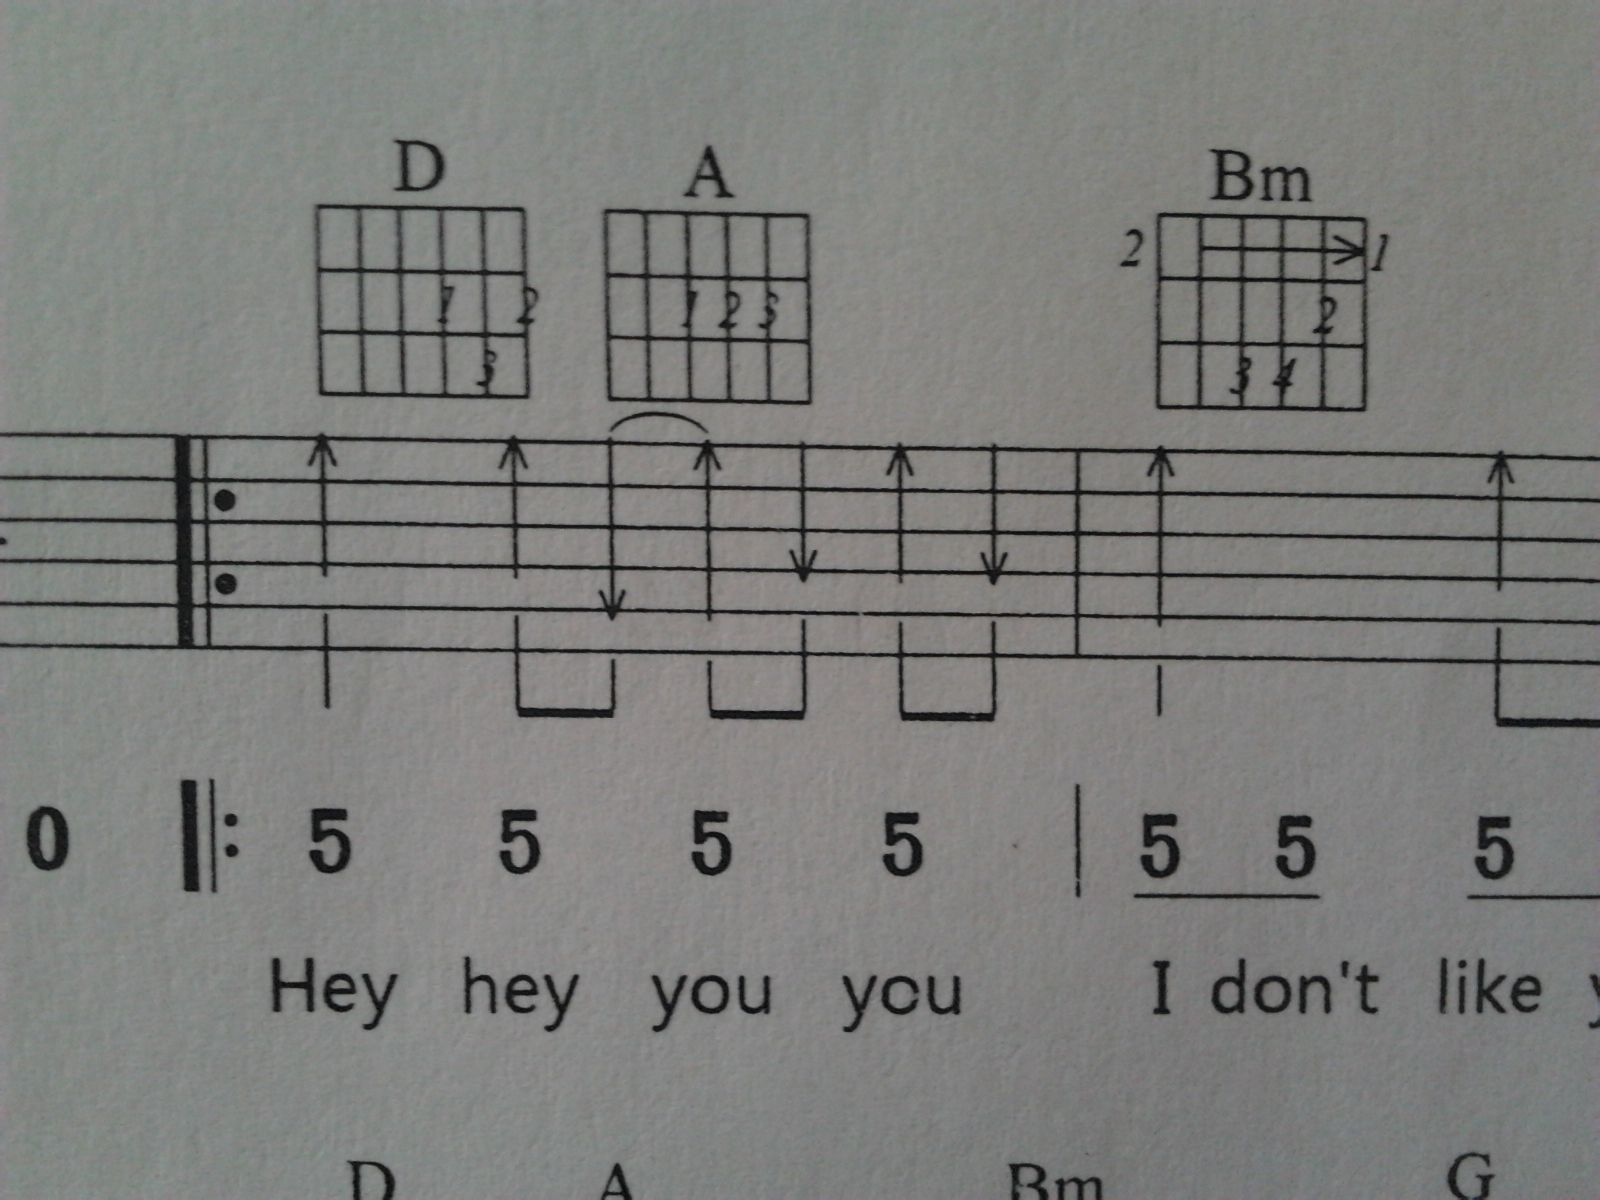 avril的女朋友吉他谱 那个上和下怎么用连音符号标记啊? 怎么弹?